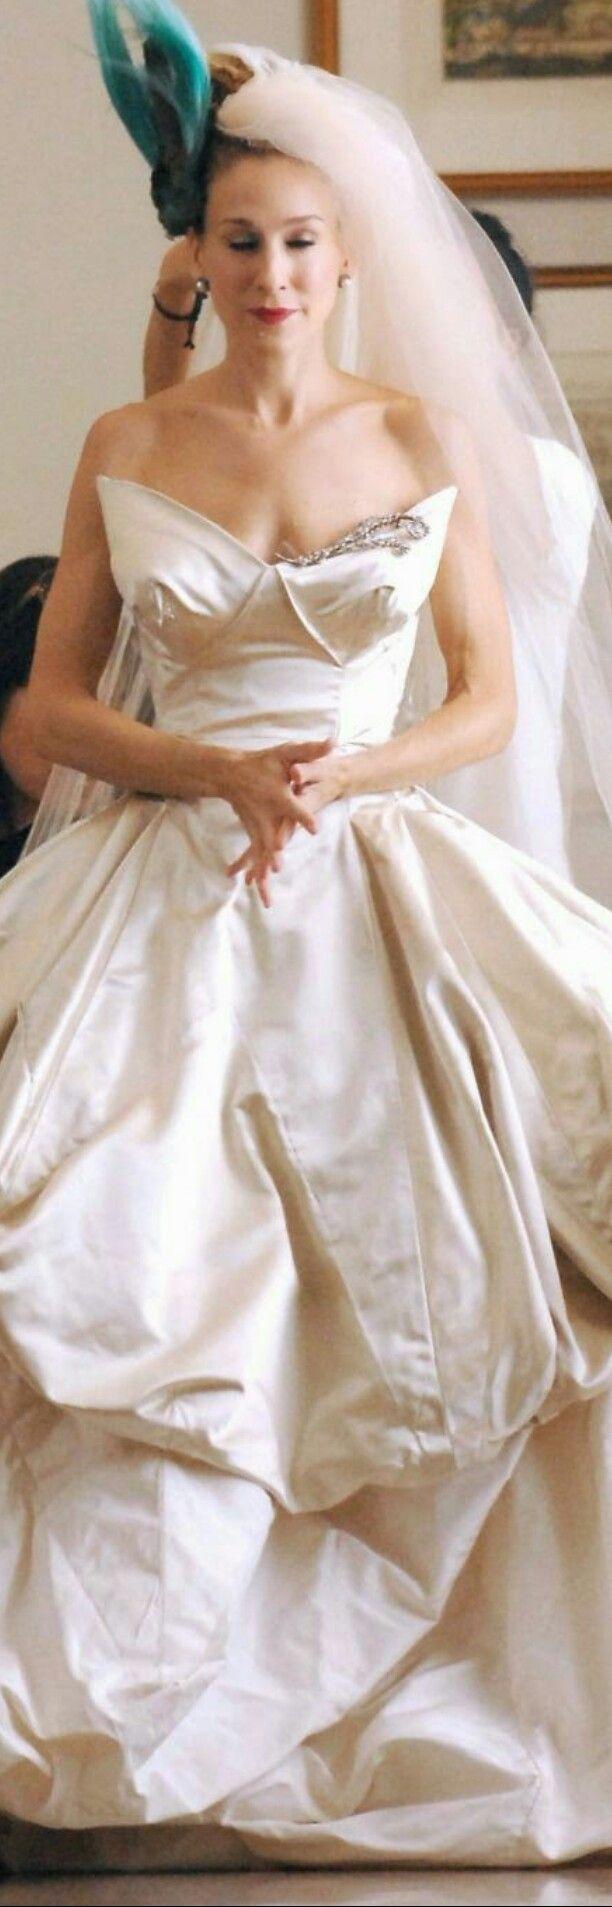 Carrie bradshaw wedding dresses photo shoot Shopping Games for Girls - Girl Games